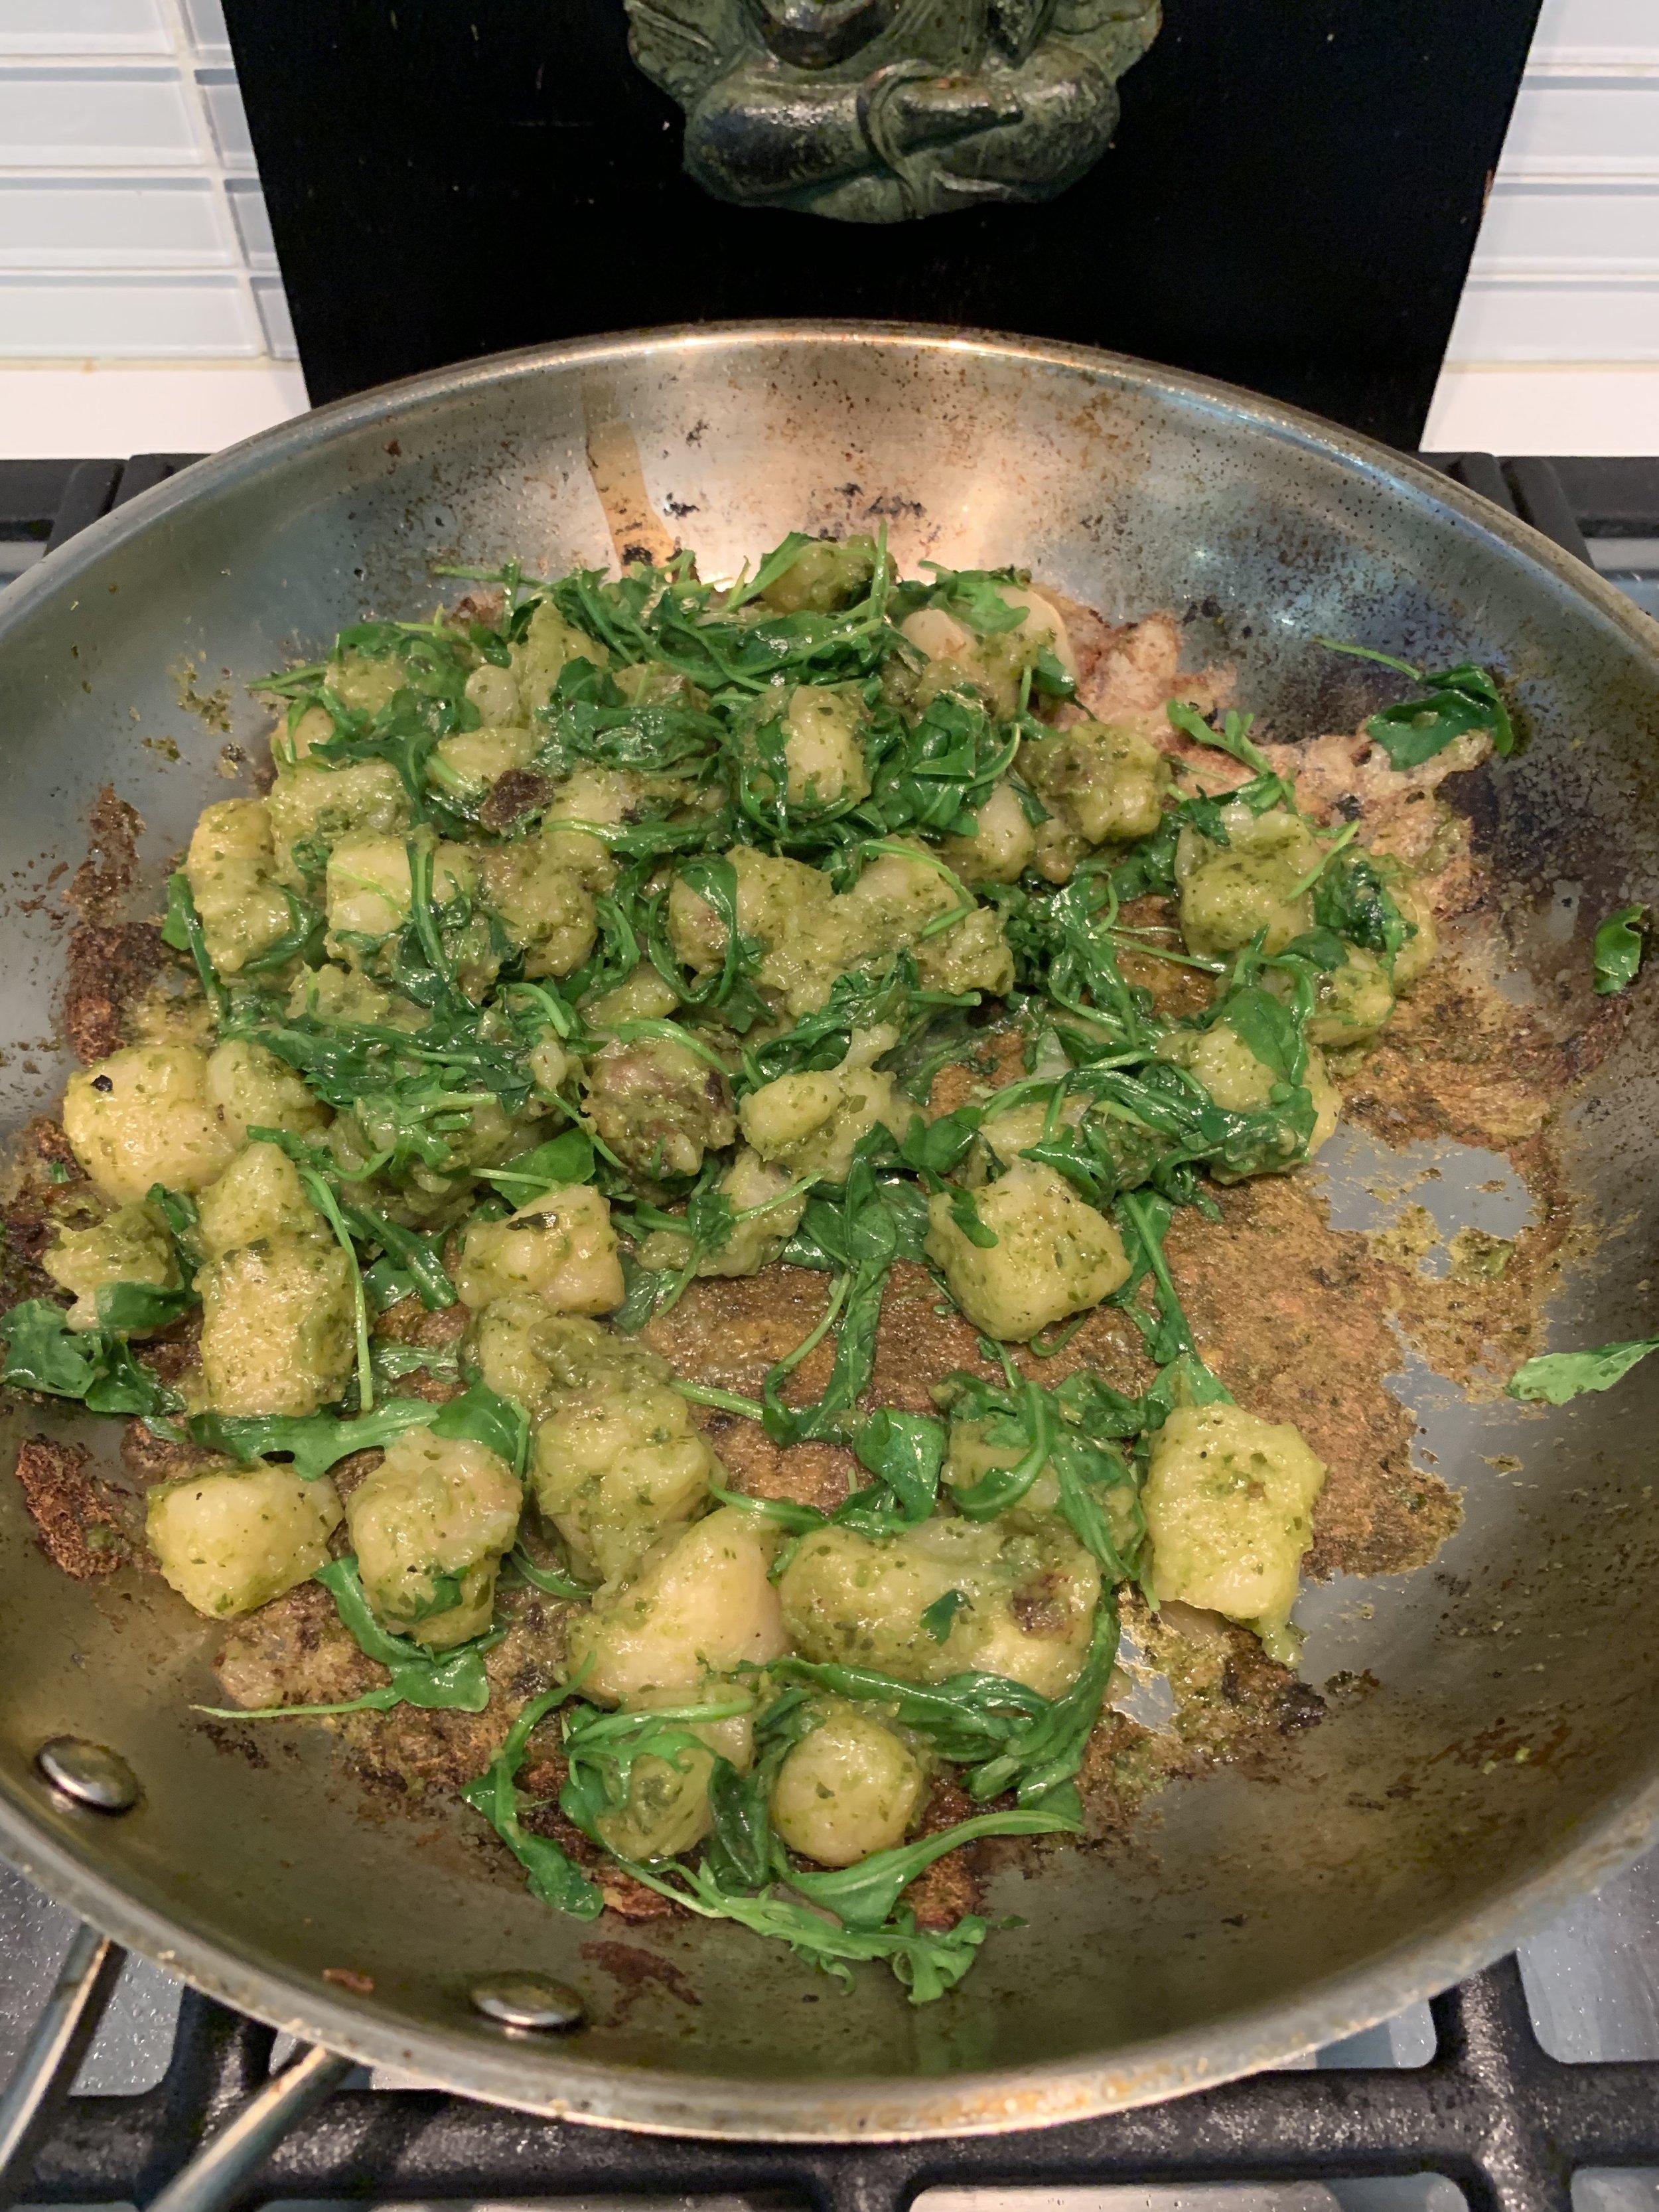 Cauliflower gnocchi with arugula + vegan kale cashew pesto!